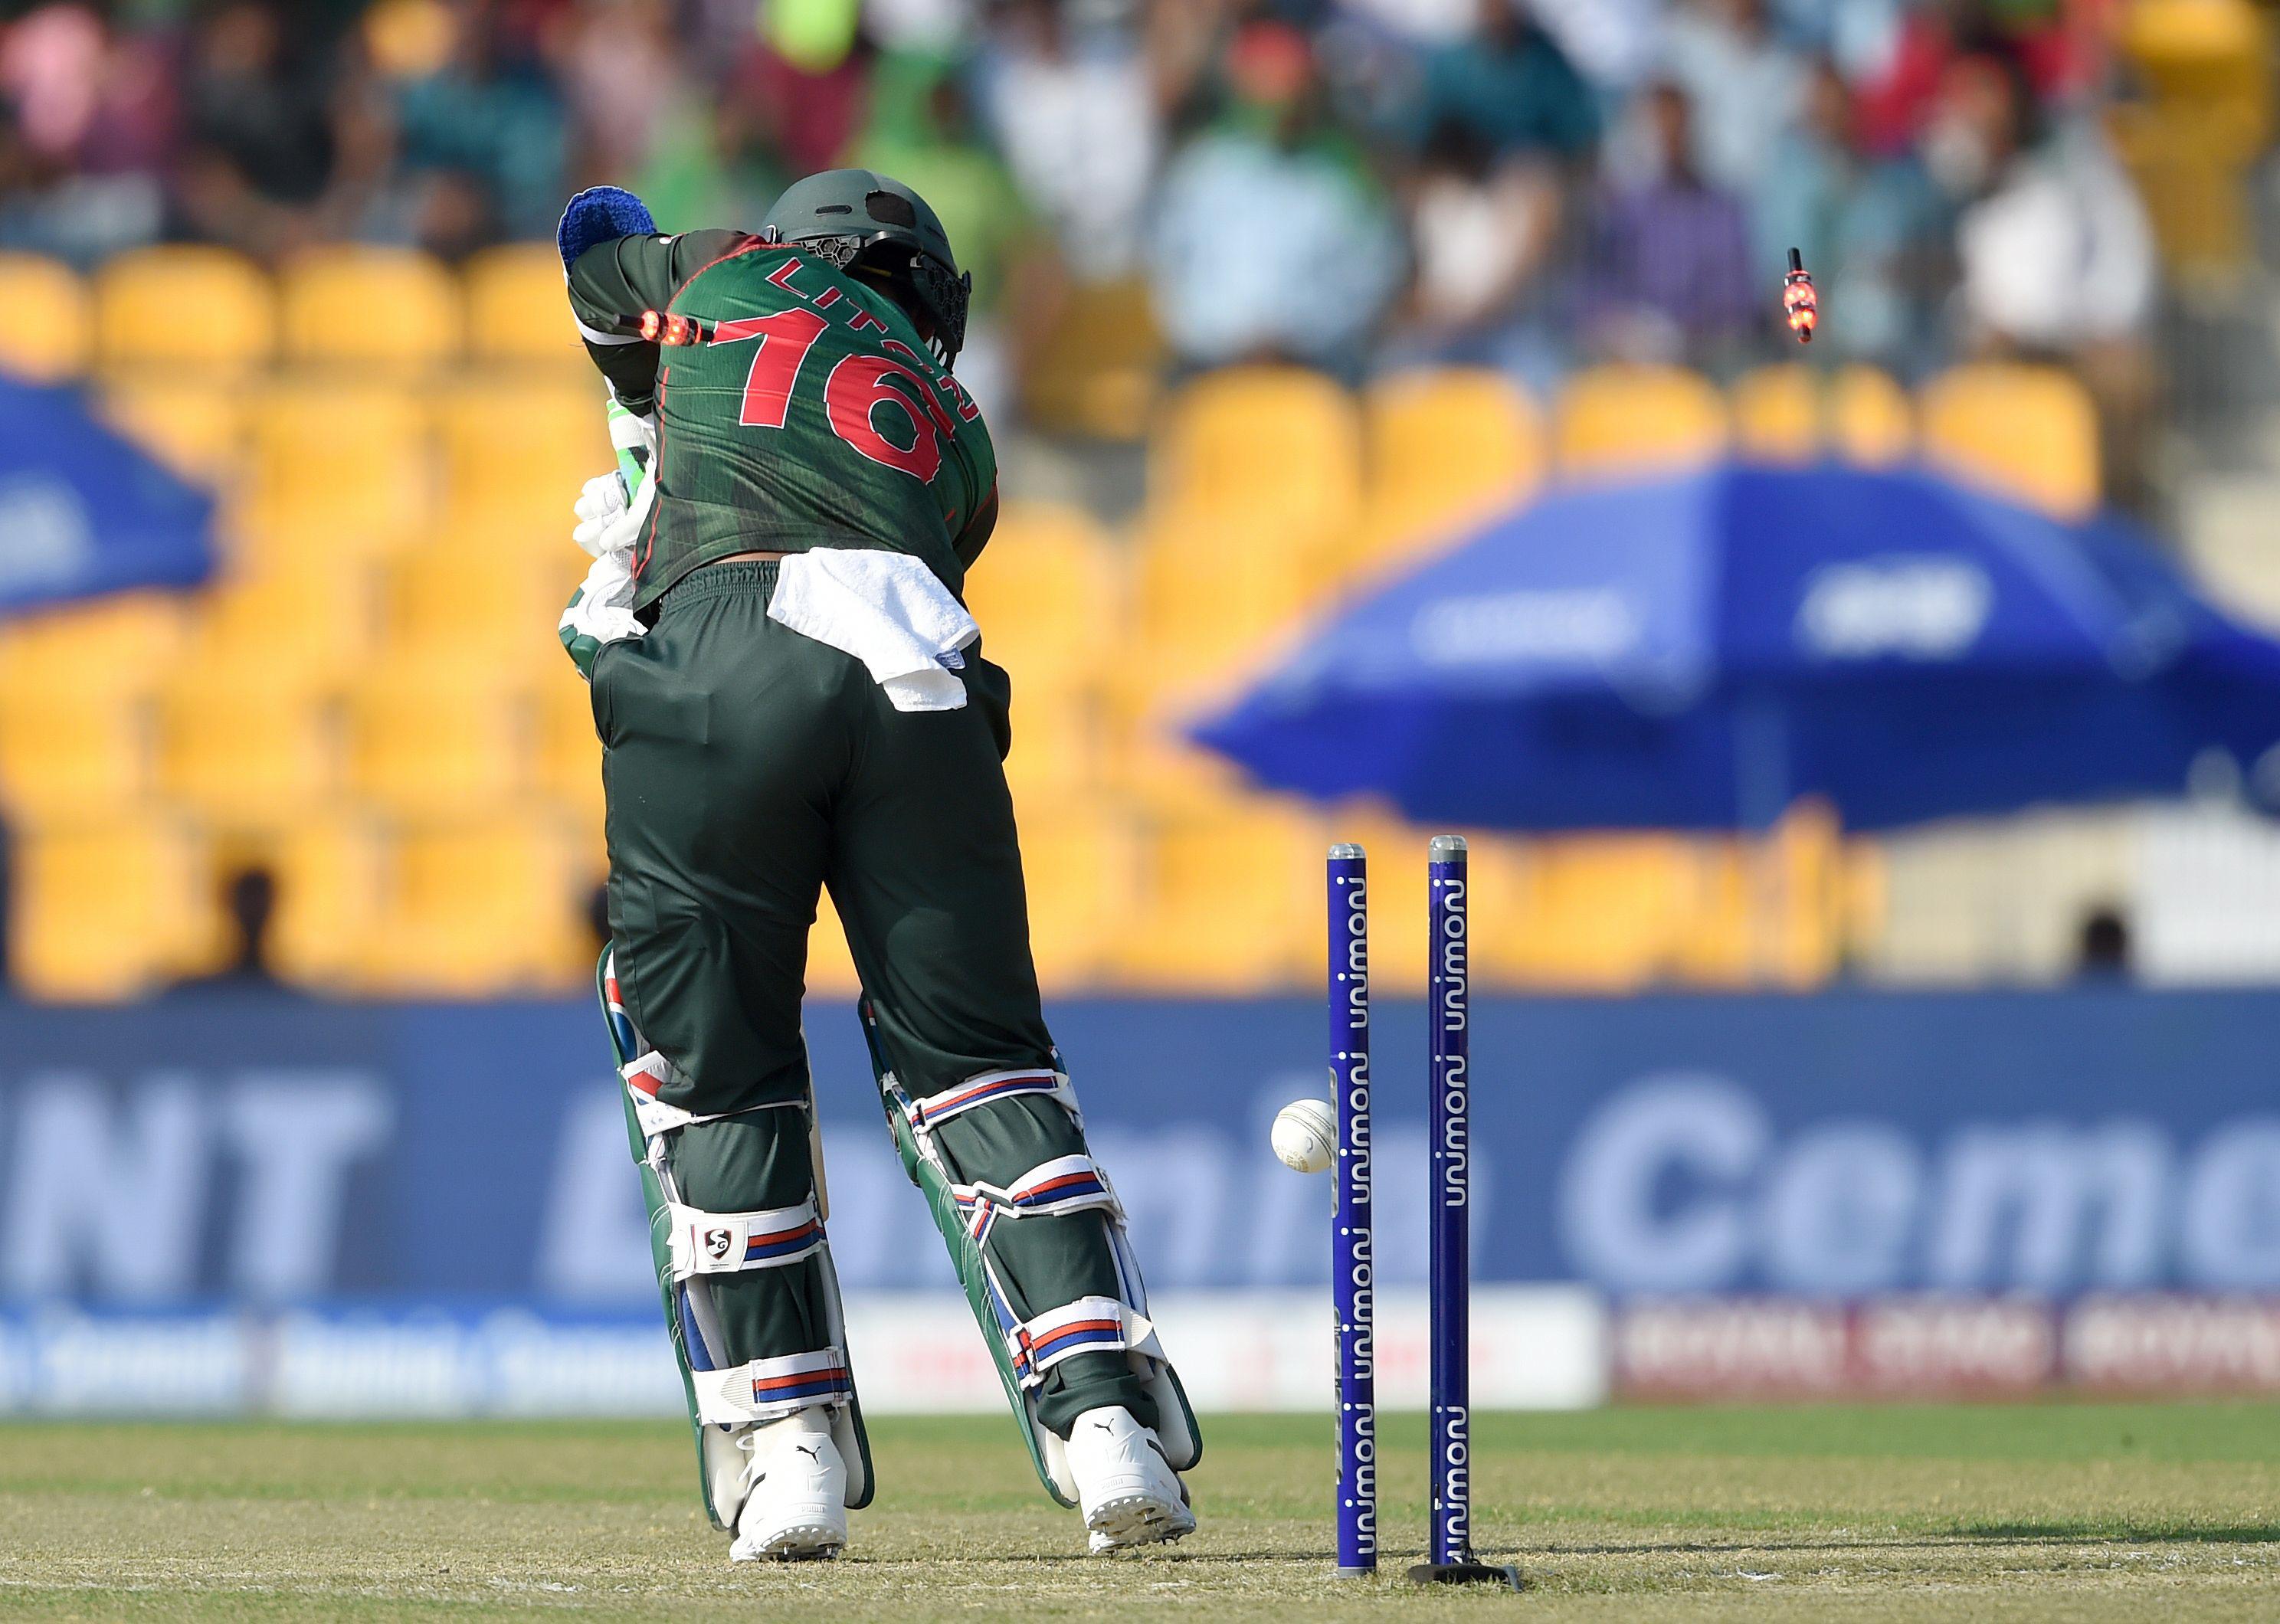 Bangladesh batsman Liton Das is dismissed by Pakistan cricketer Junaid Khan